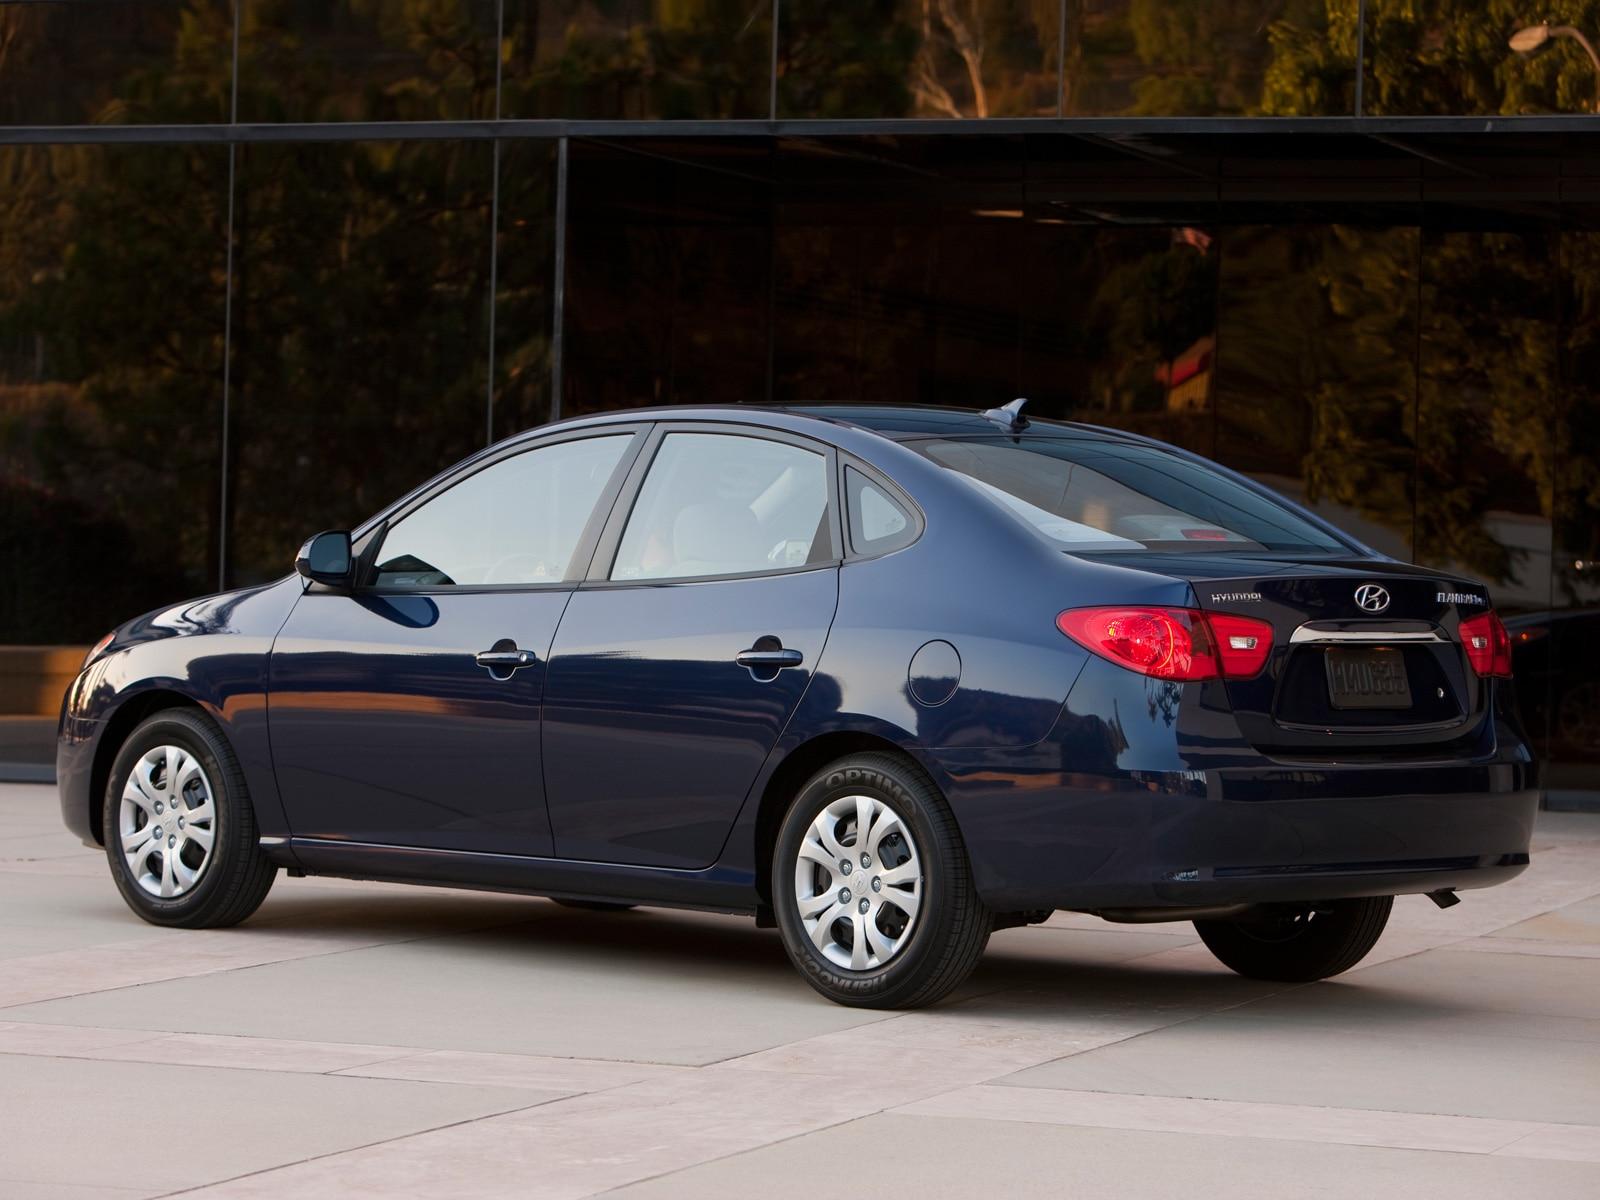 2010 hyundai elantra blue hyundai midsize sedan review automobile magazine. Black Bedroom Furniture Sets. Home Design Ideas